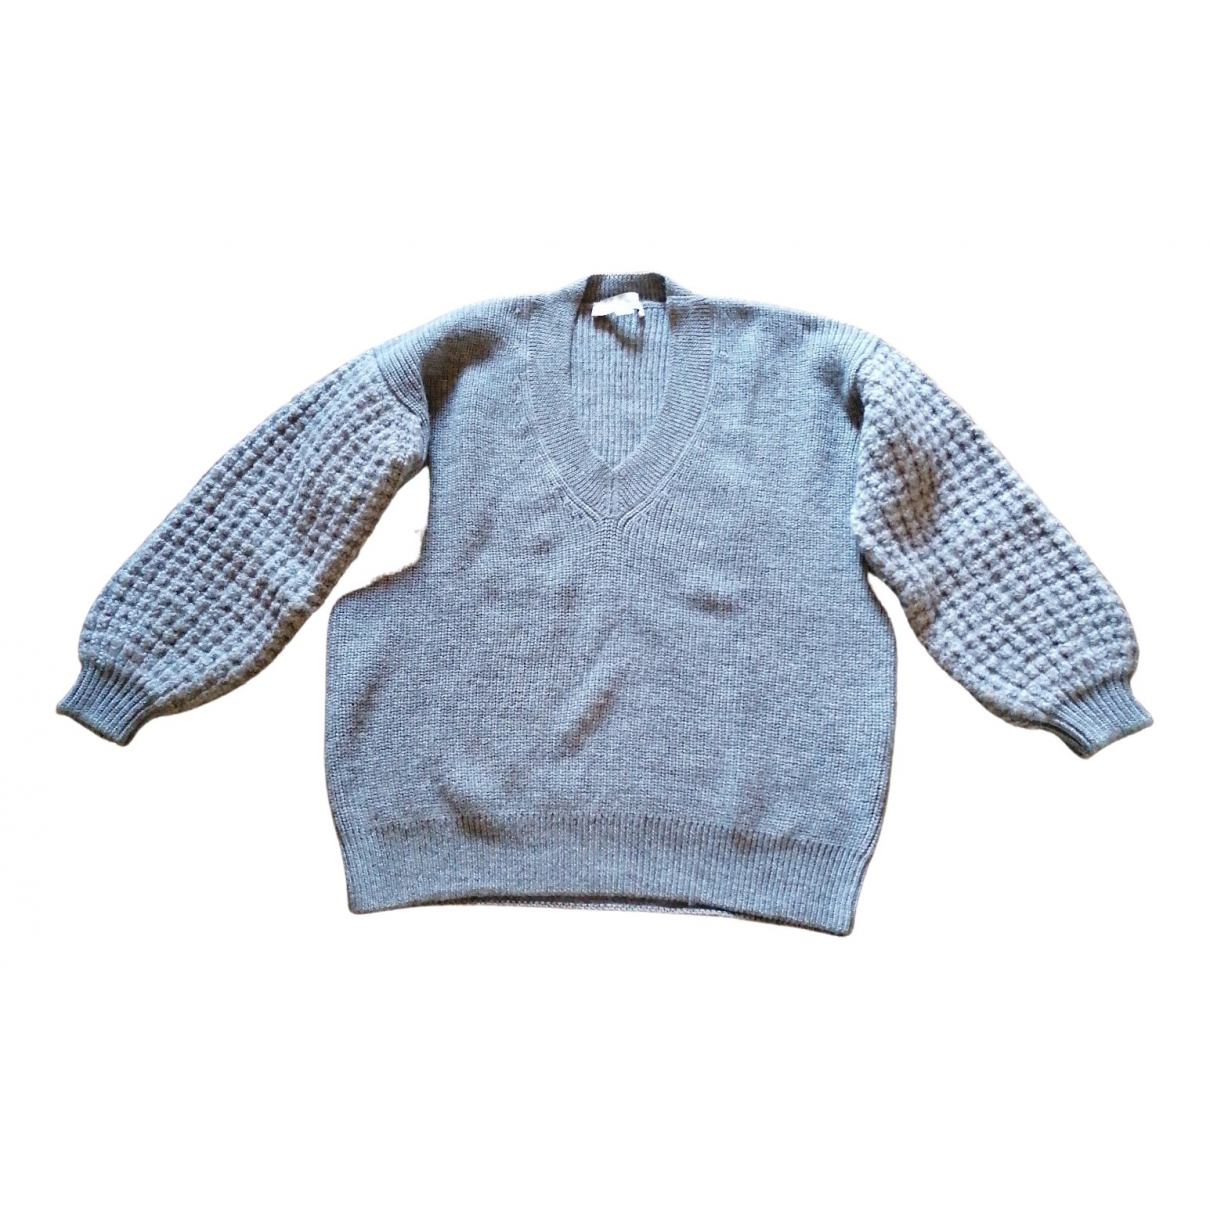 Stella Mccartney \N Grey Cashmere Knitwear for Women M International